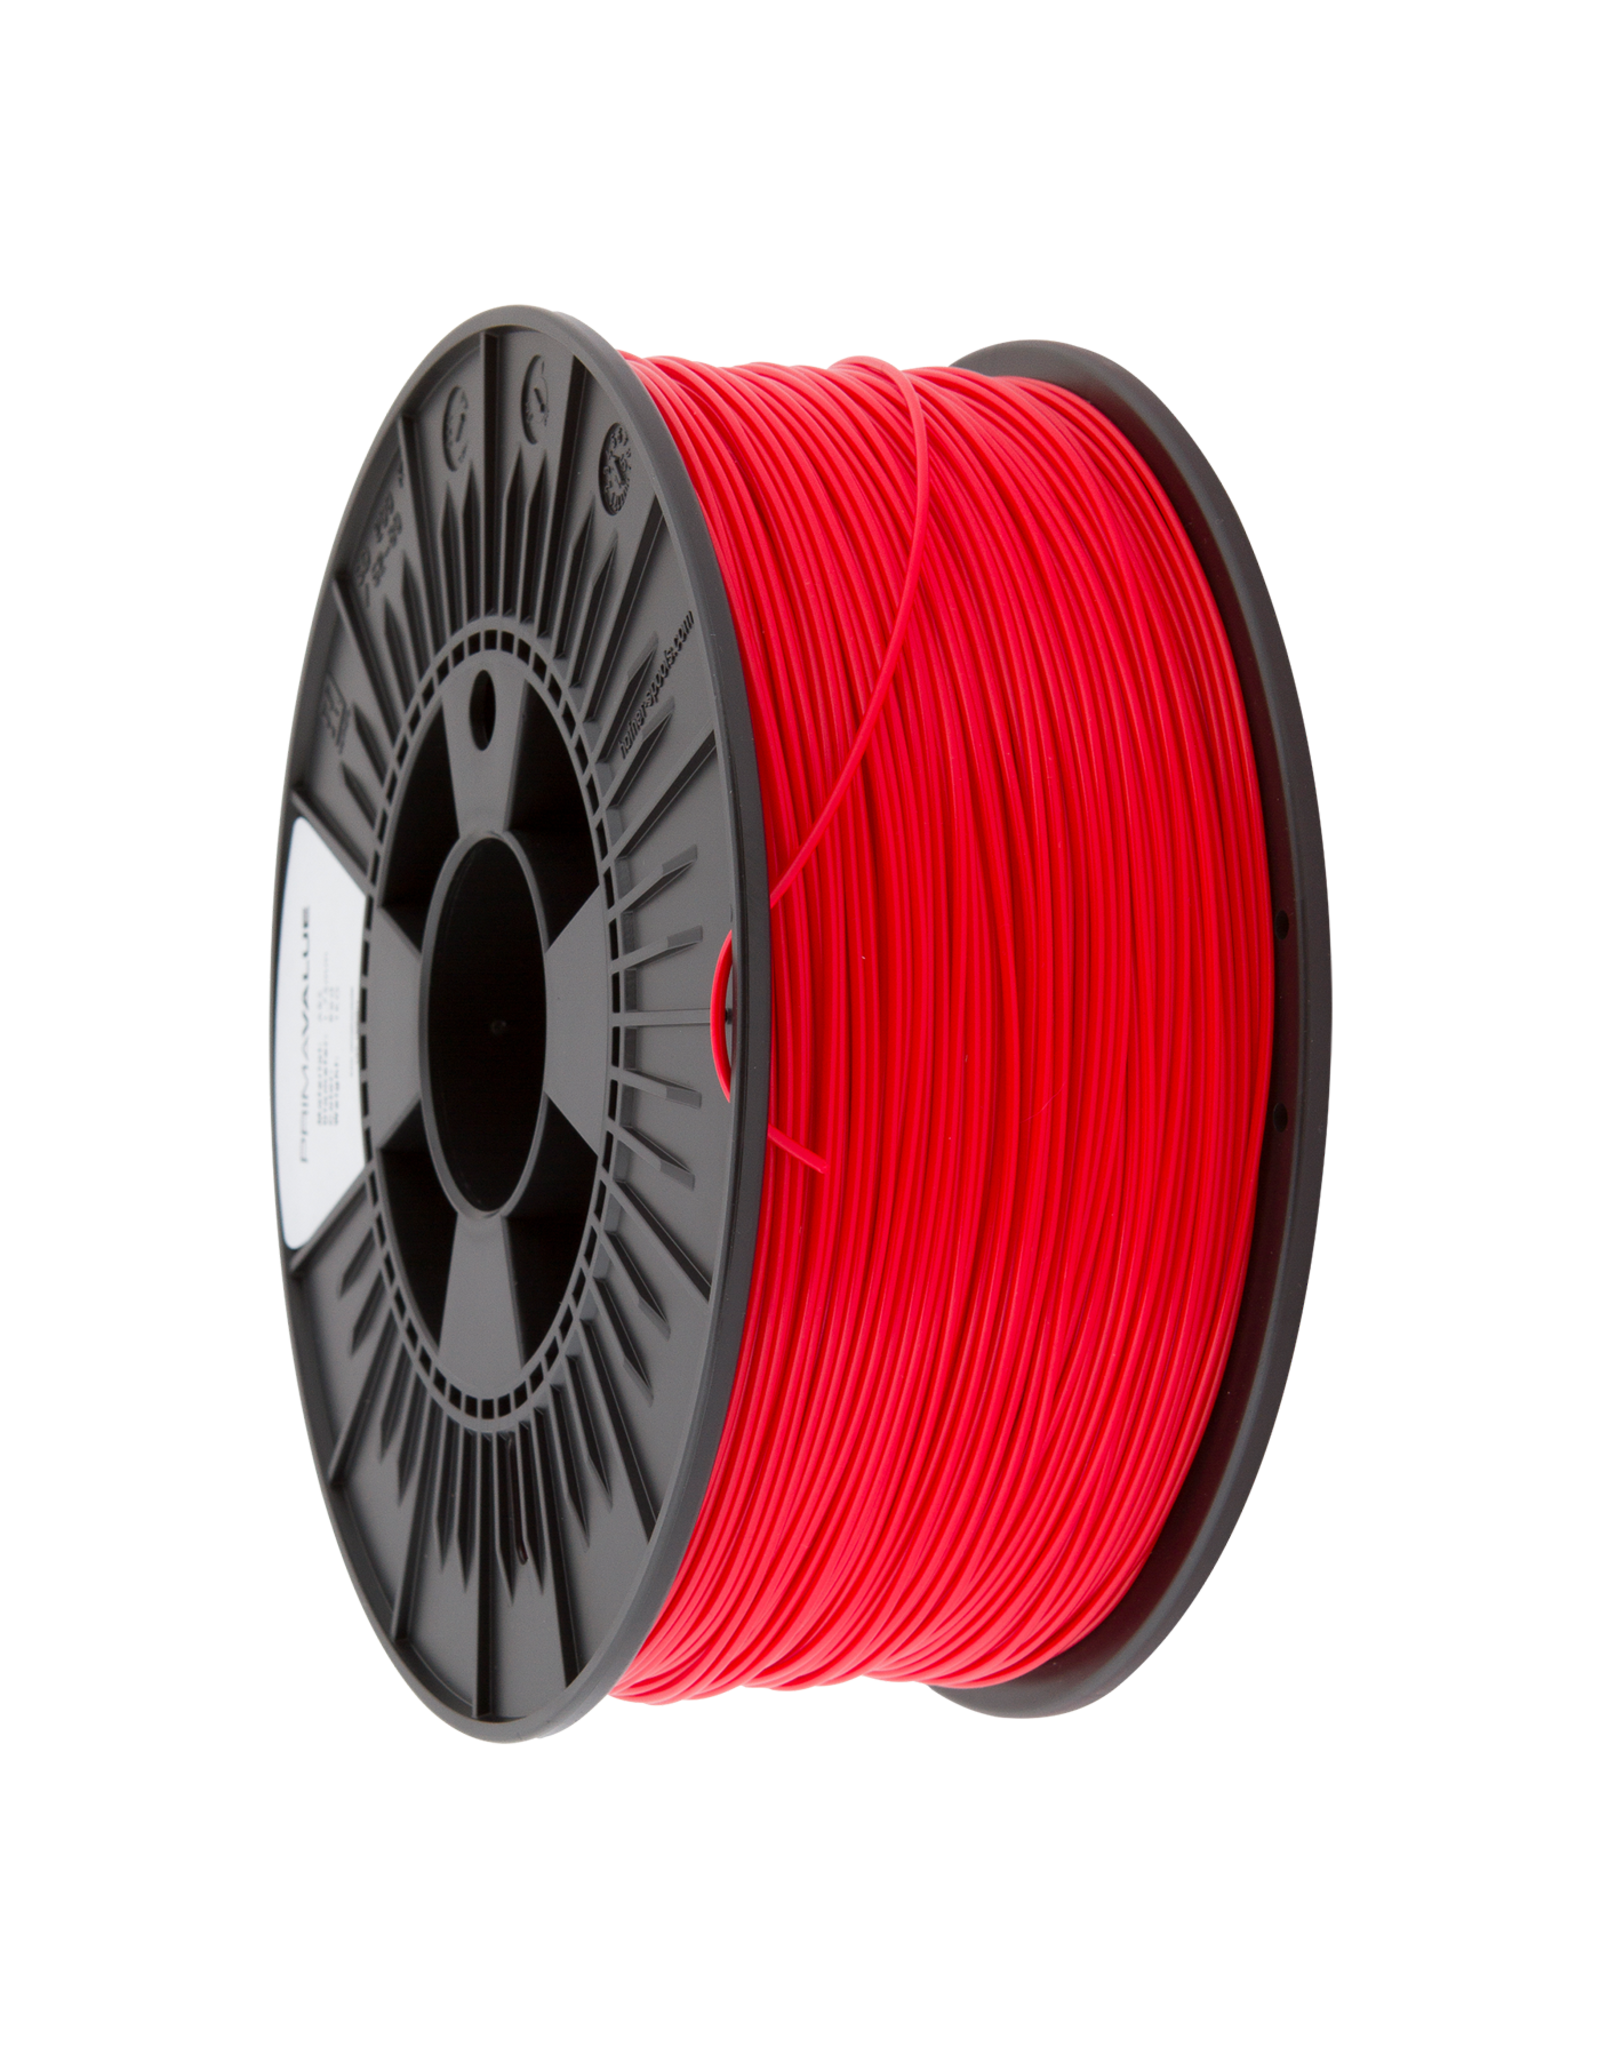 Prima PrimaValue ABS Filament - 1.75mm - 1 kg - Rood